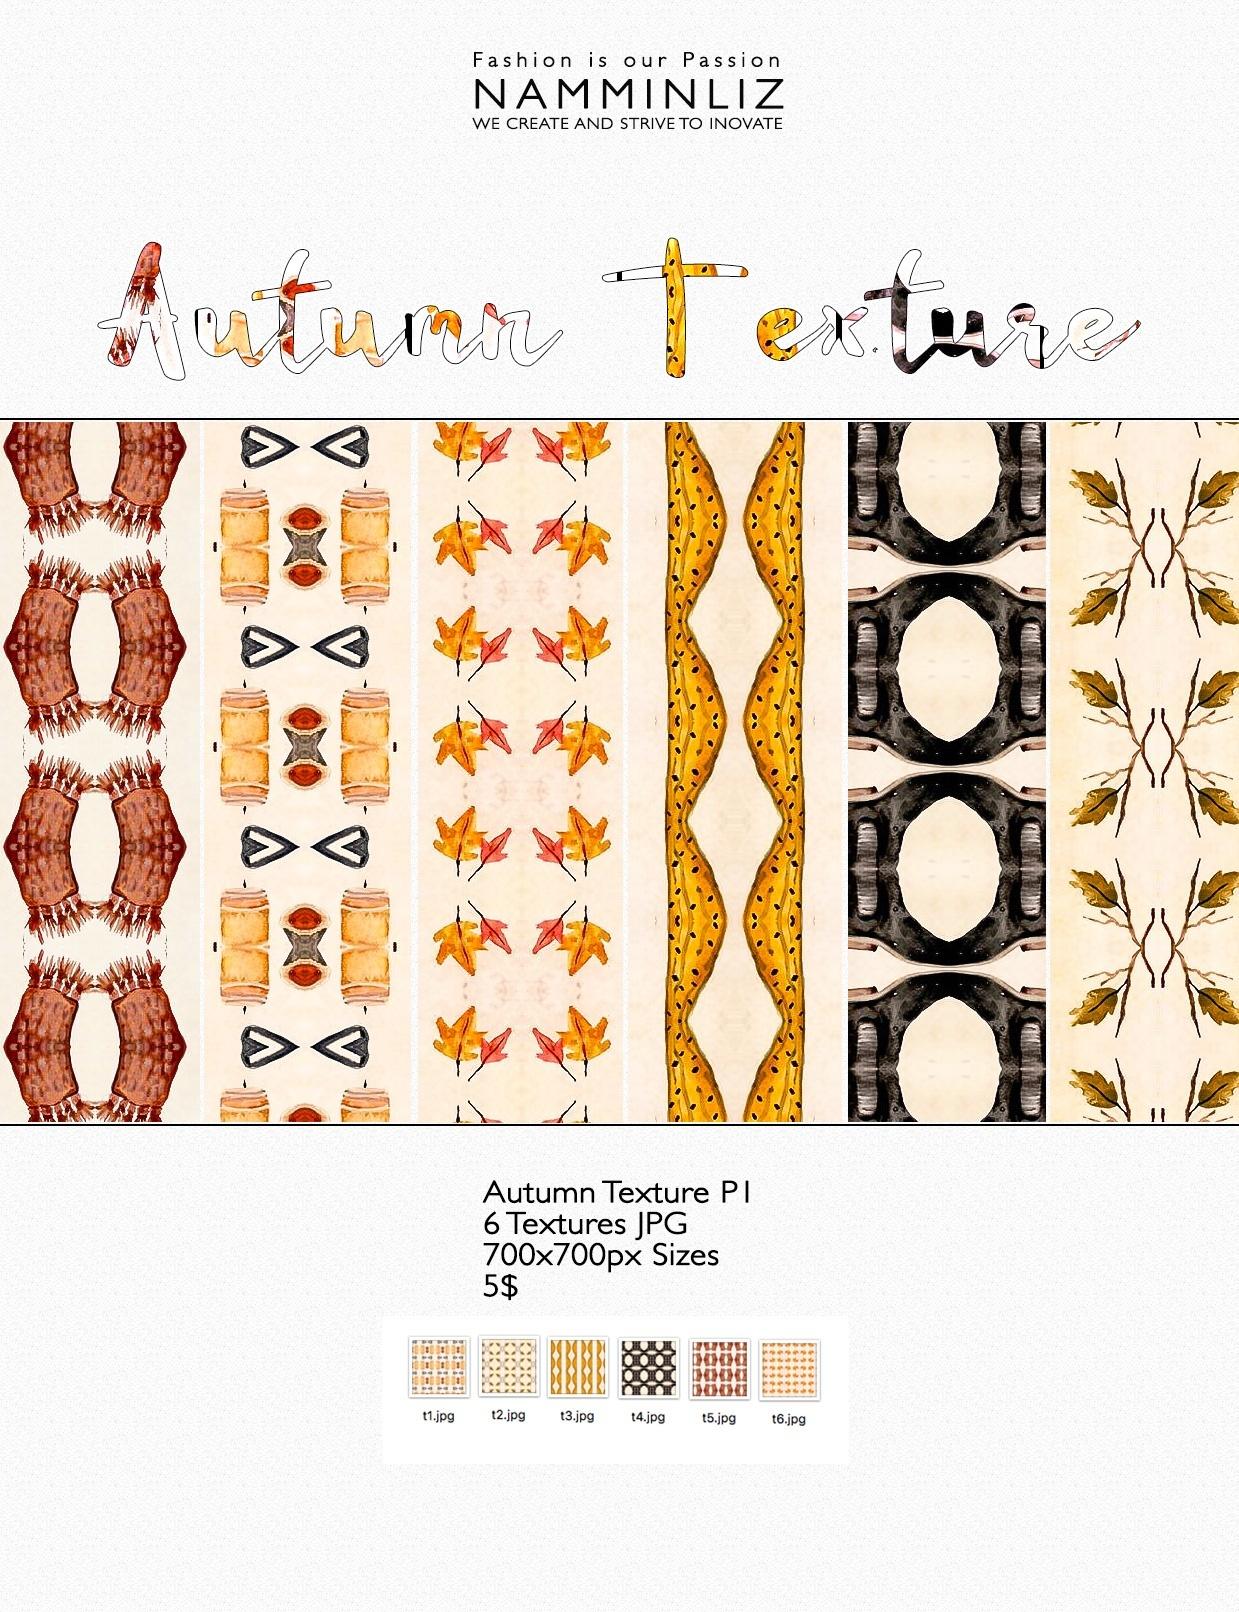 Autumn Texture P1 - 6 Textures JPG 700x700px